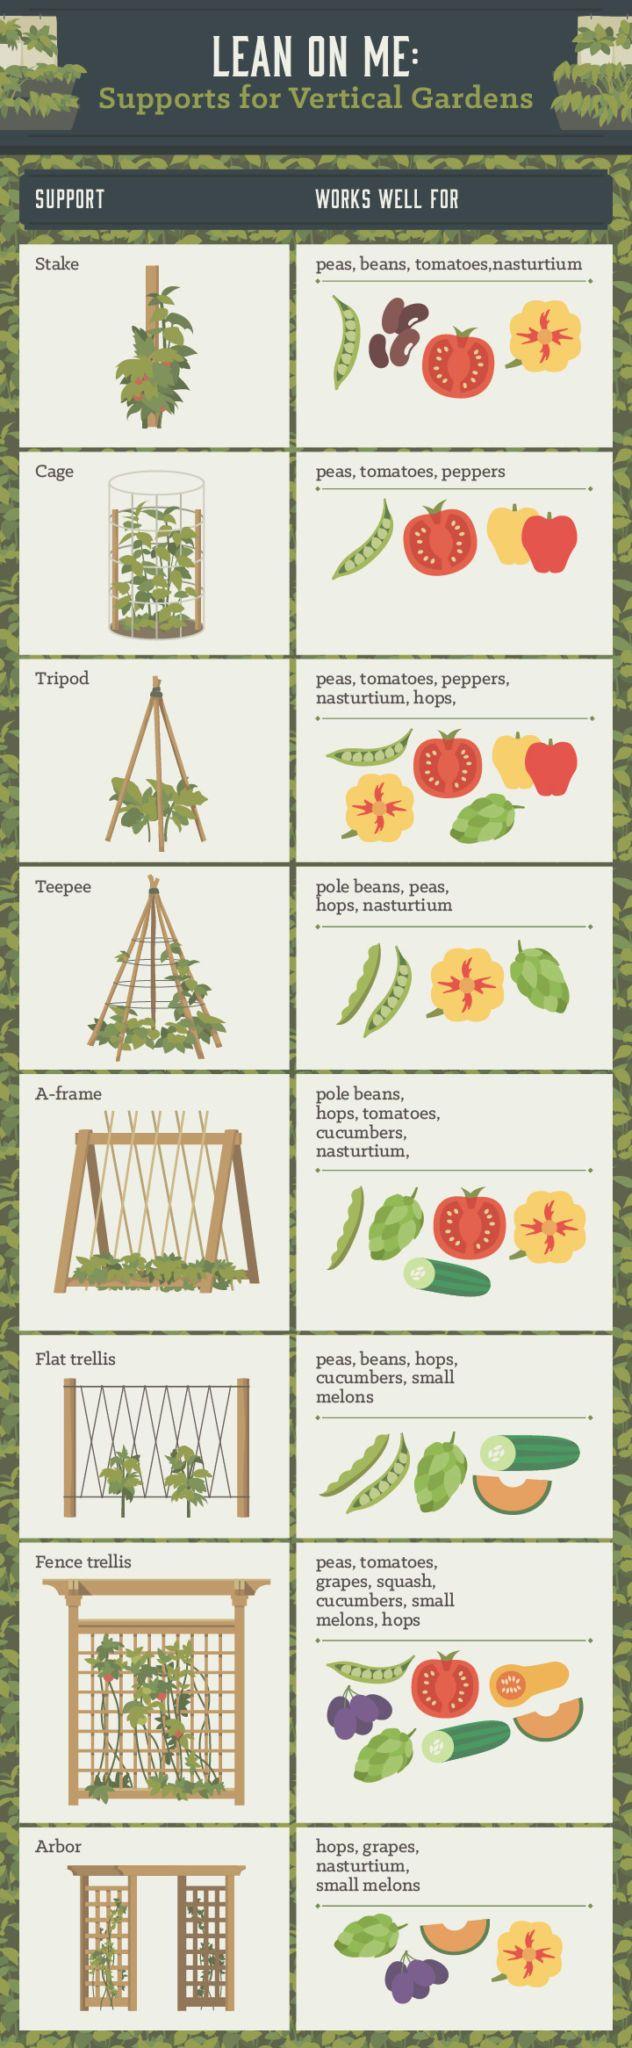 5 Gorgeous Vertical Gardening Beds